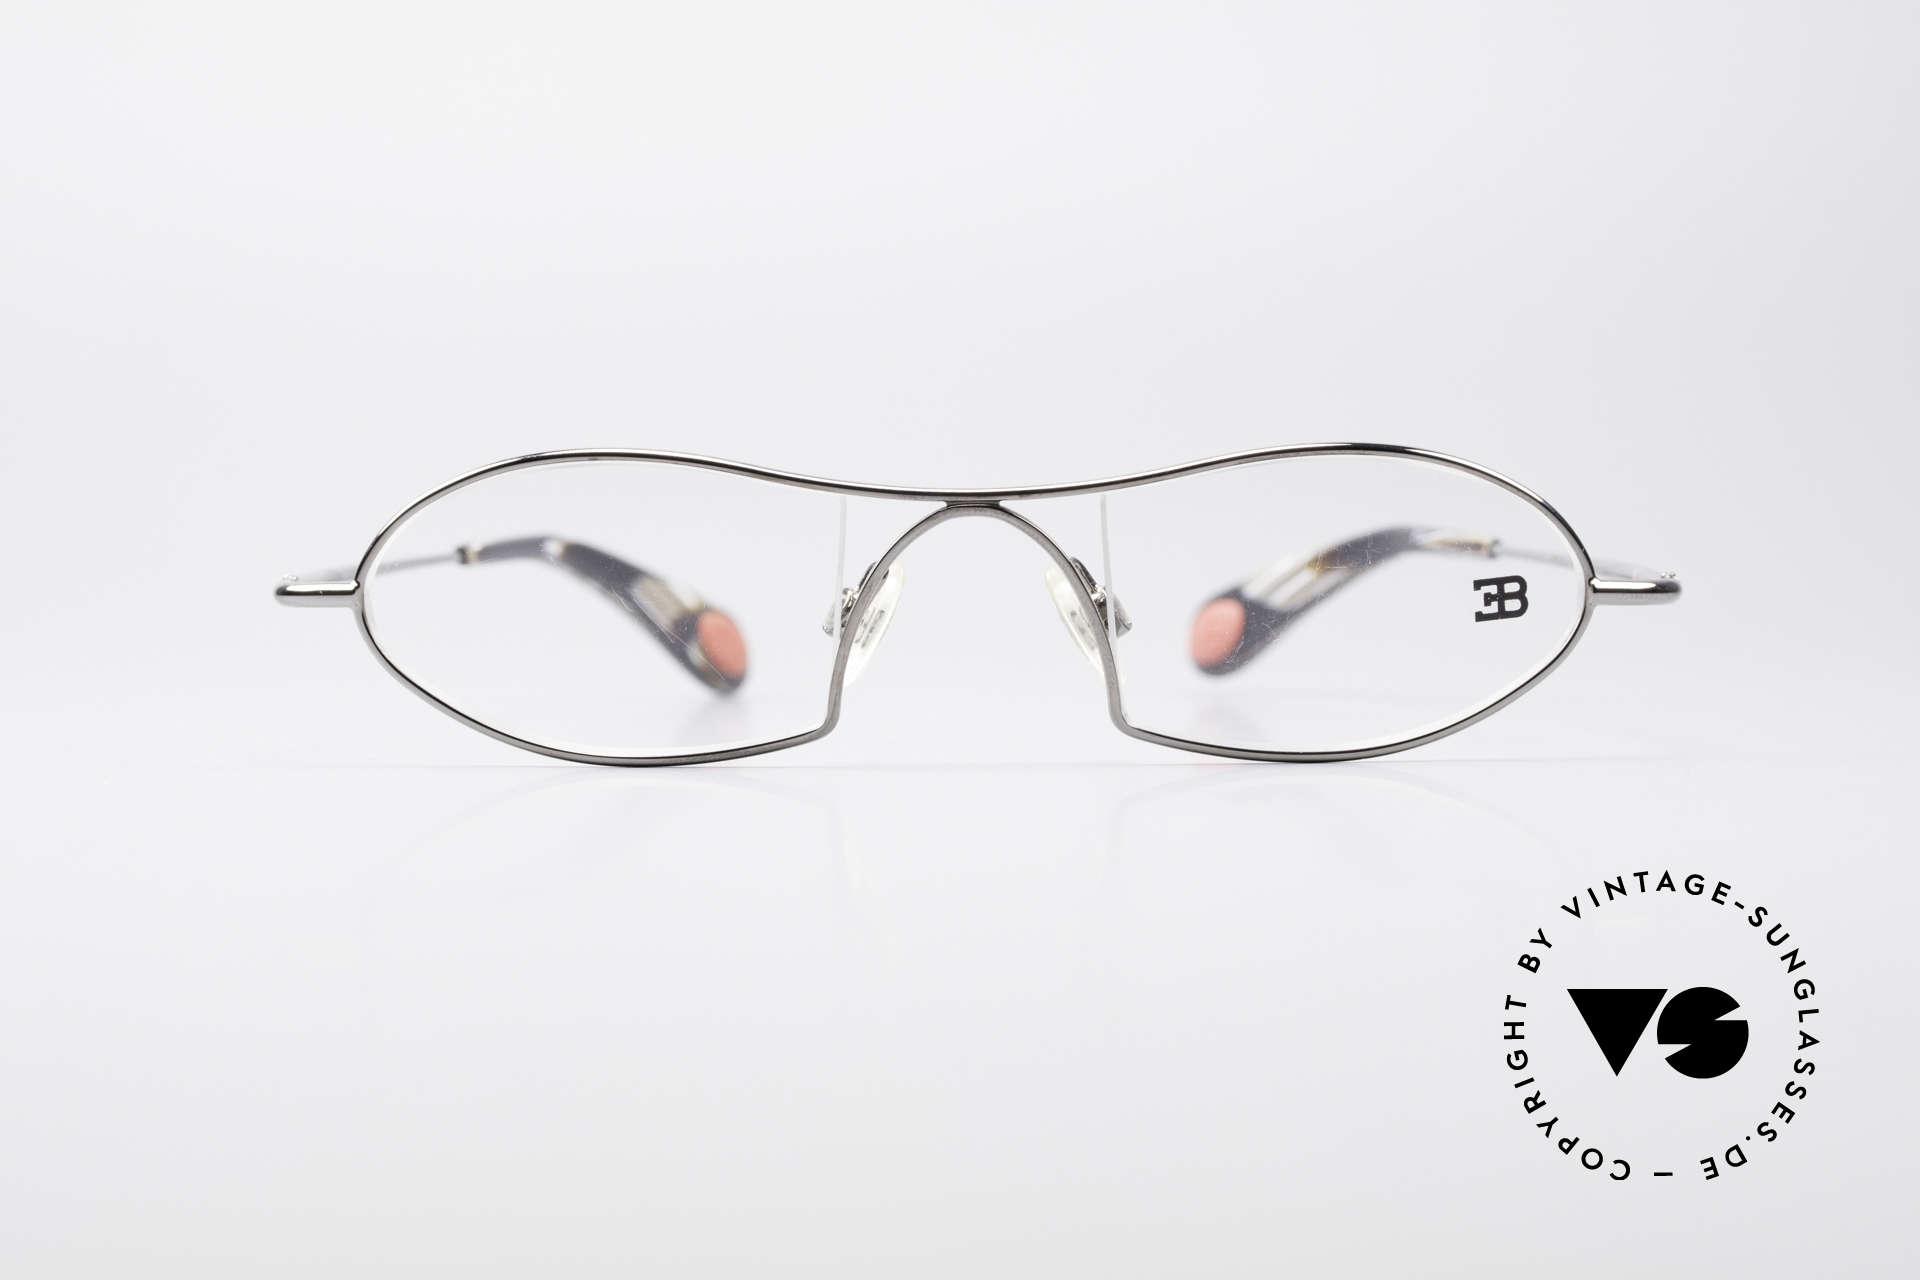 Bugatti 351 Odotype Rare Men's Designer Frame, original BUGATTI high-tech eyeglass-frame, Made for Men